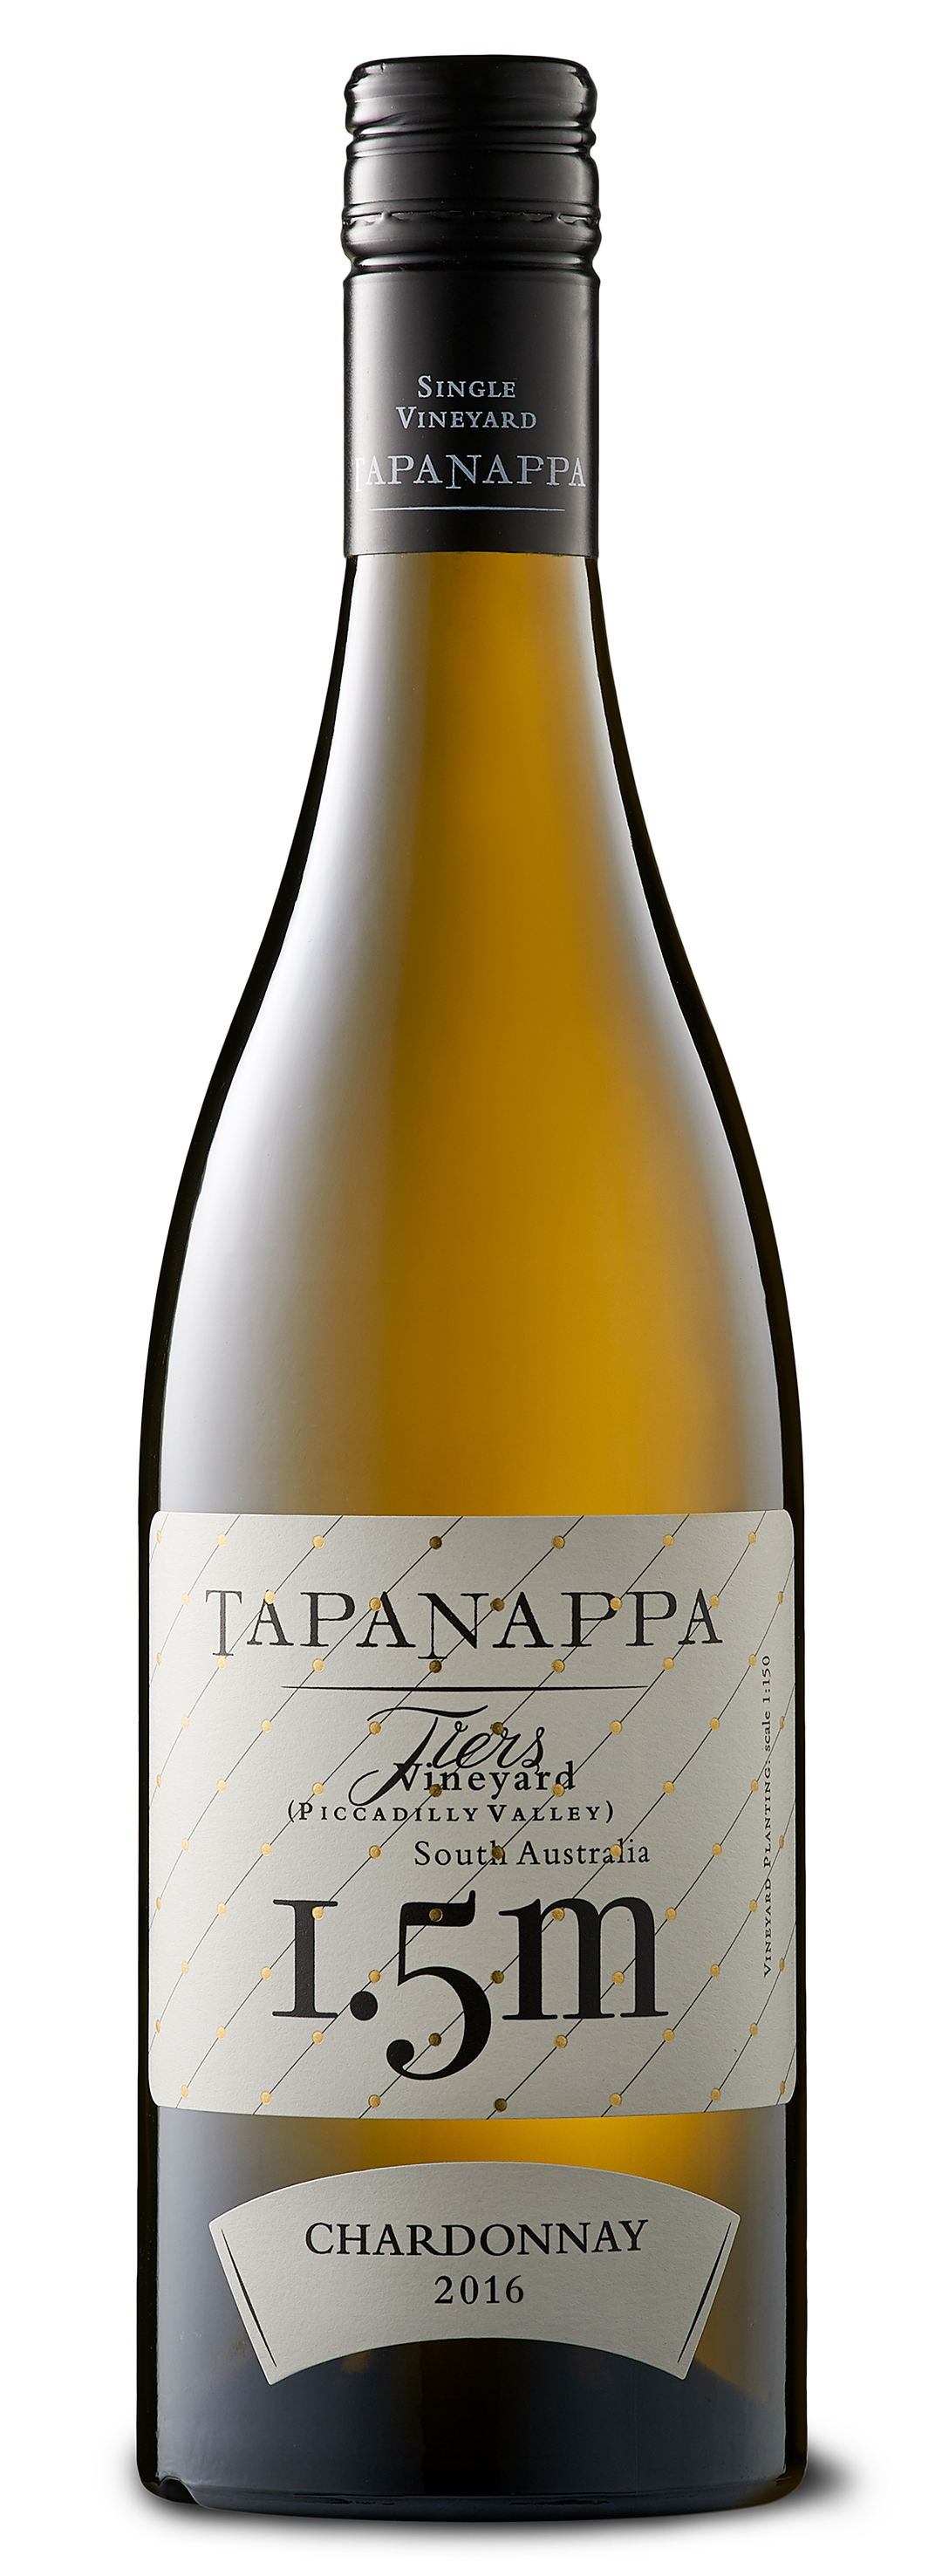 Tapanappa Tiers Vineyard 1.5m 2016 Chanrdonnay bottleshot